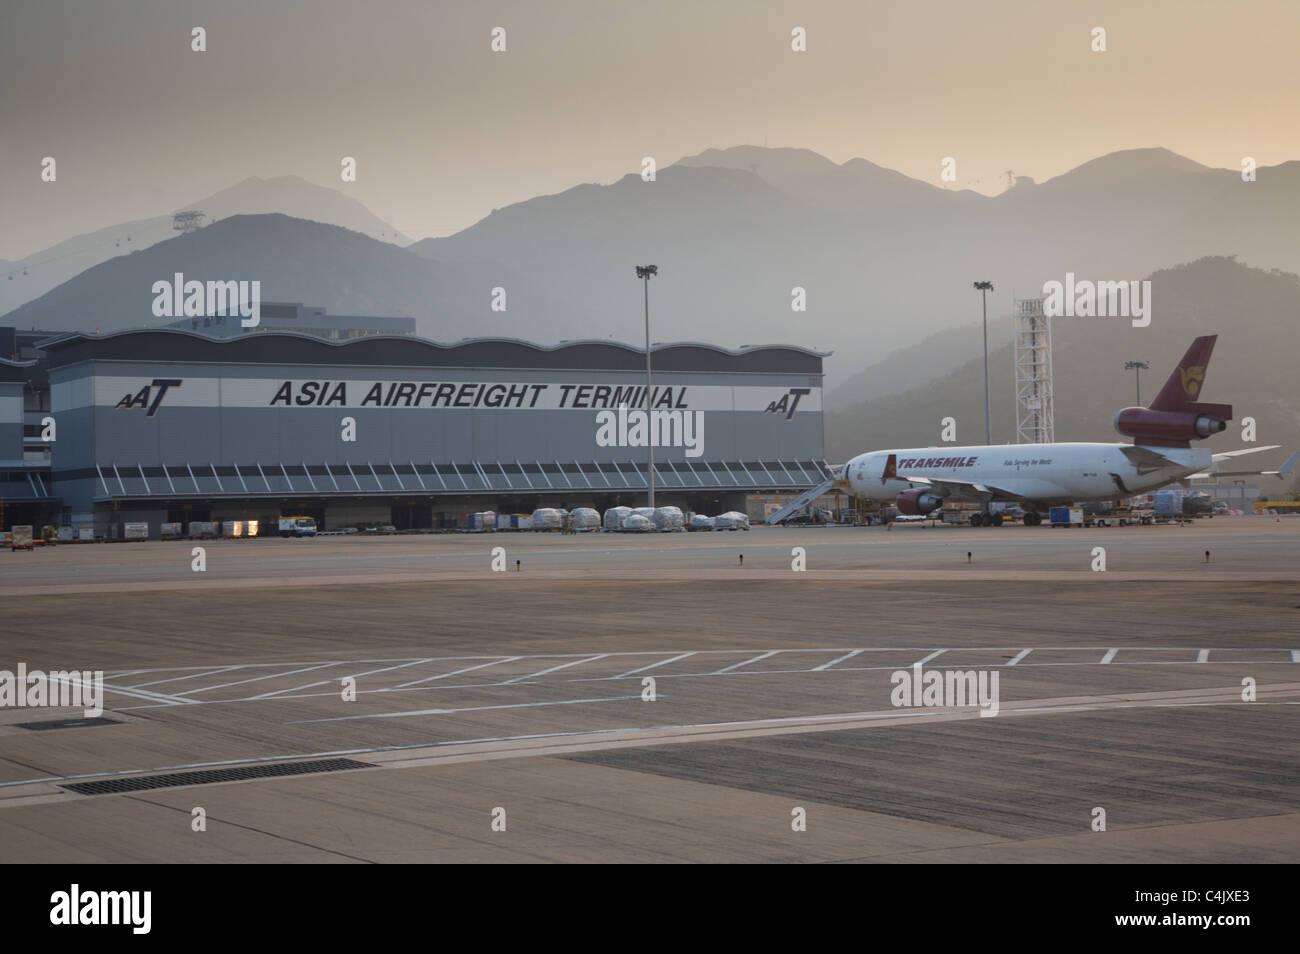 Asia Airfreight Terminal Chek Lap Kok Airport - Stock Image